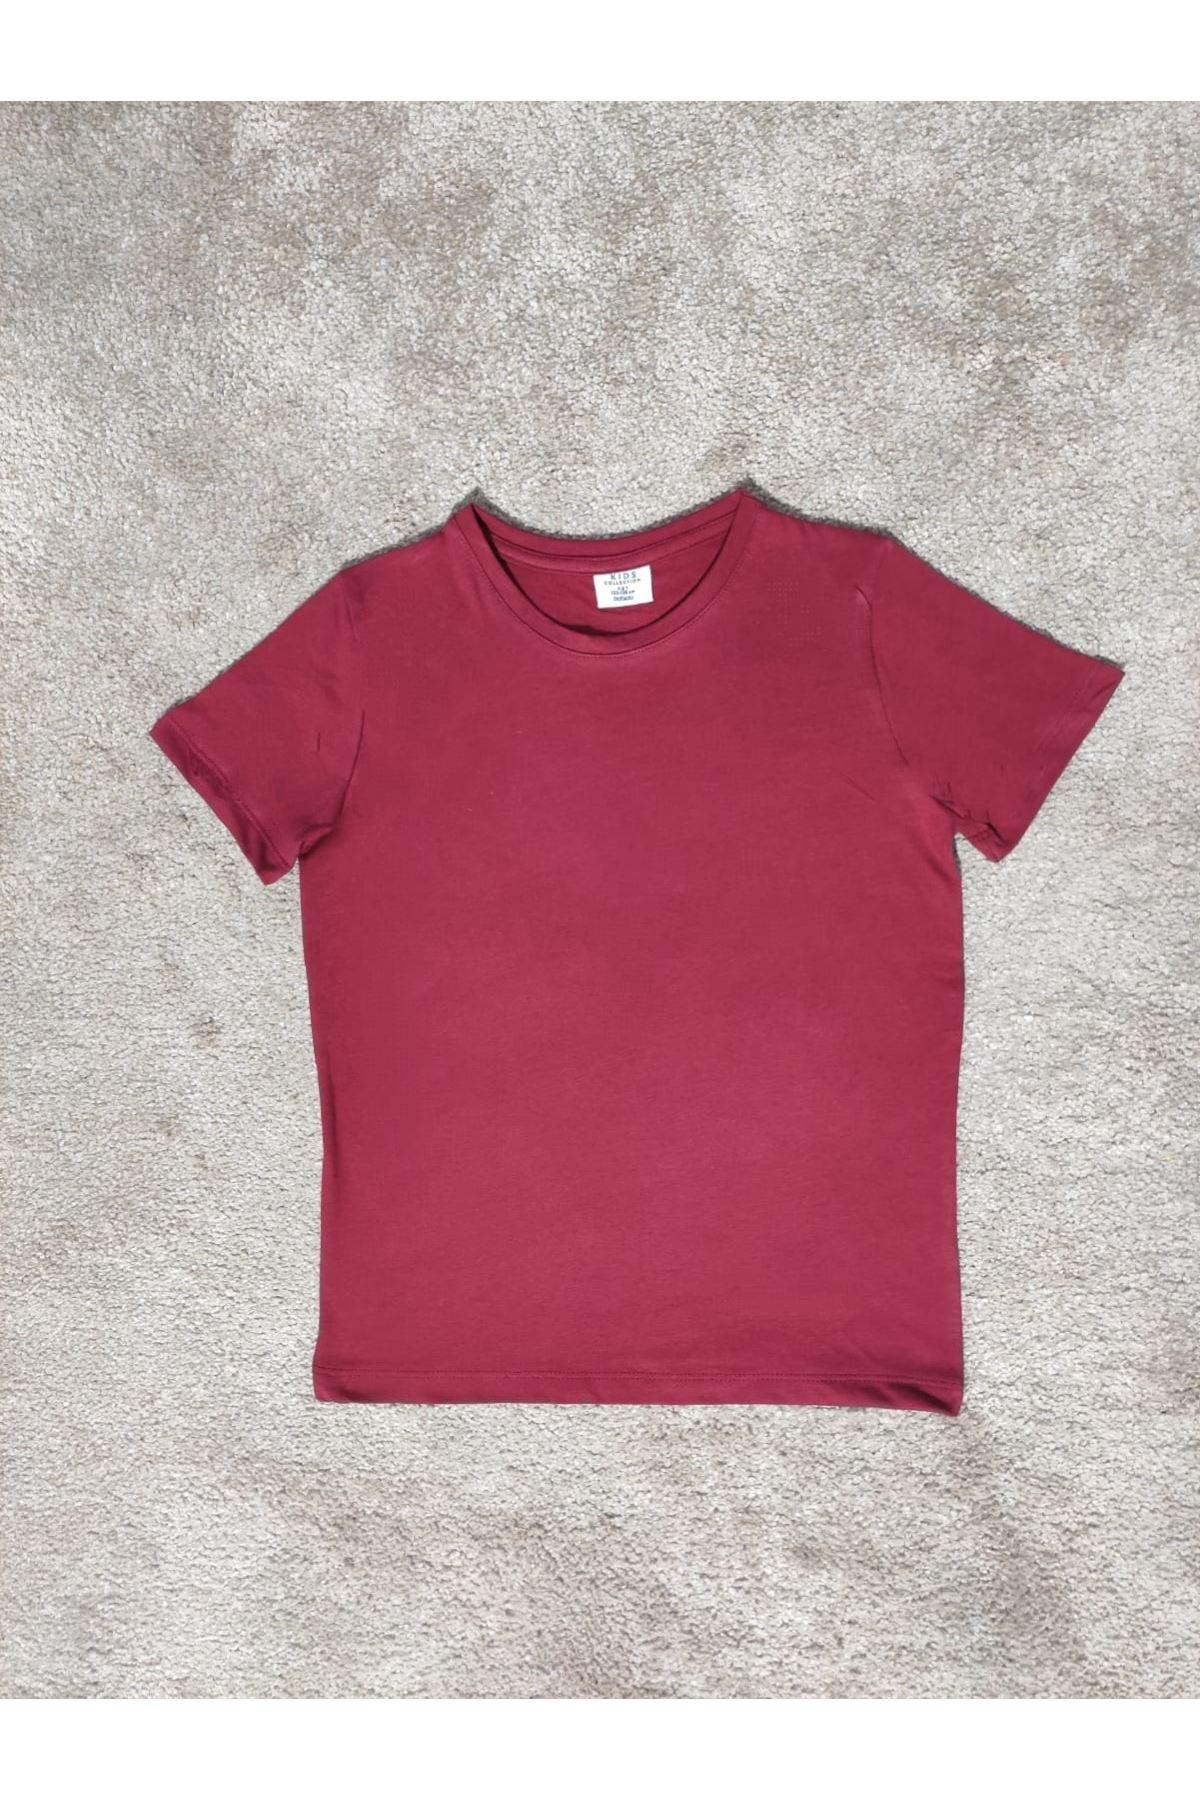 Kız Çocuk Bisiklet Yaka Bordo T-shirt